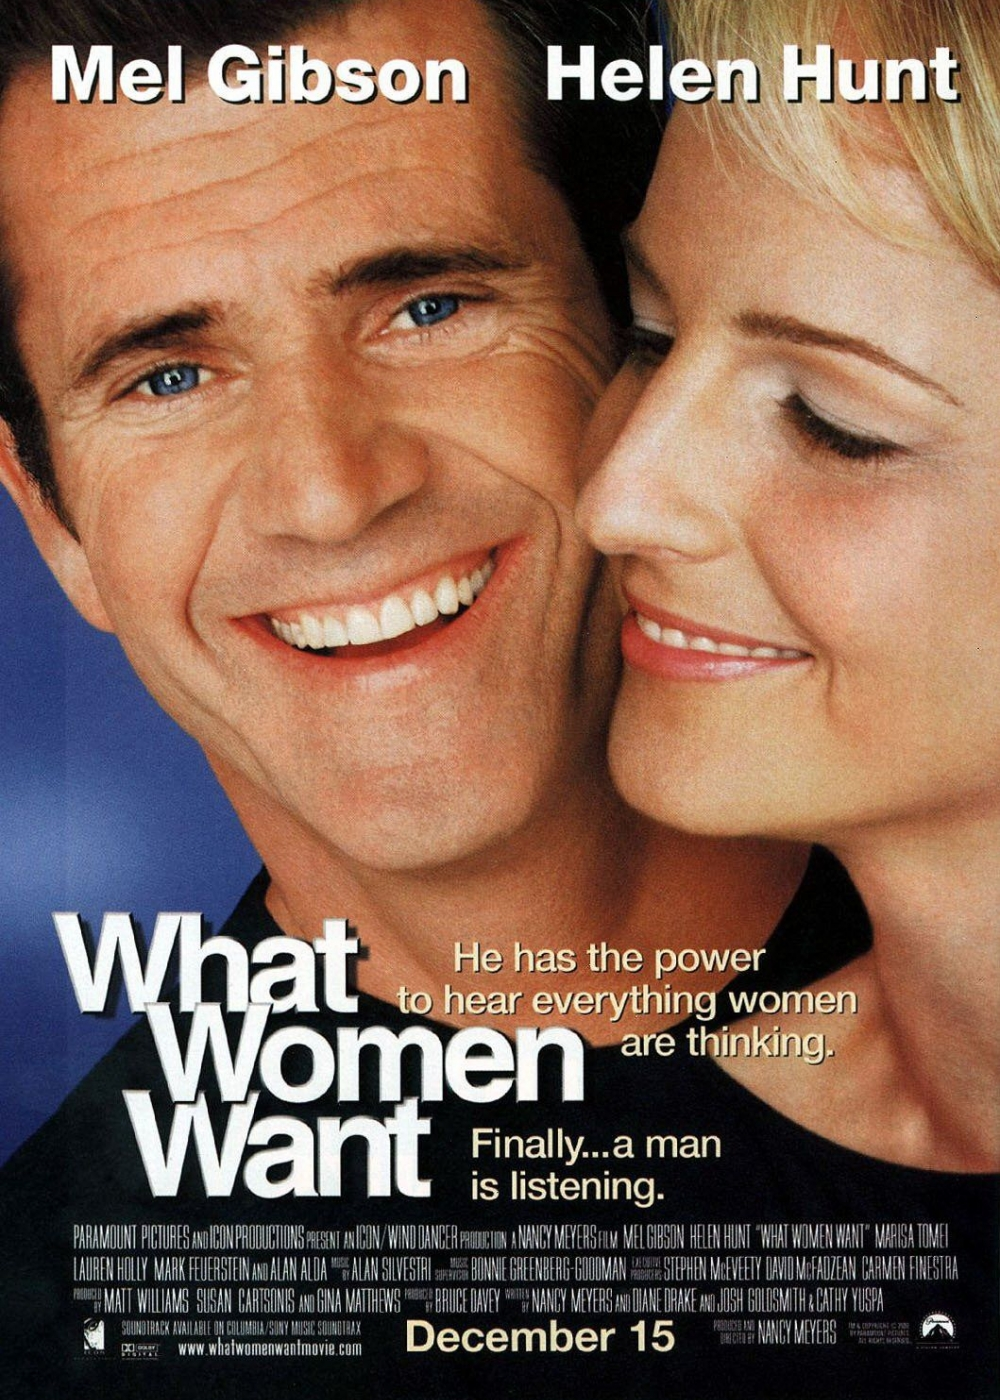 Was Frauen wollen   Film   FilmPaul